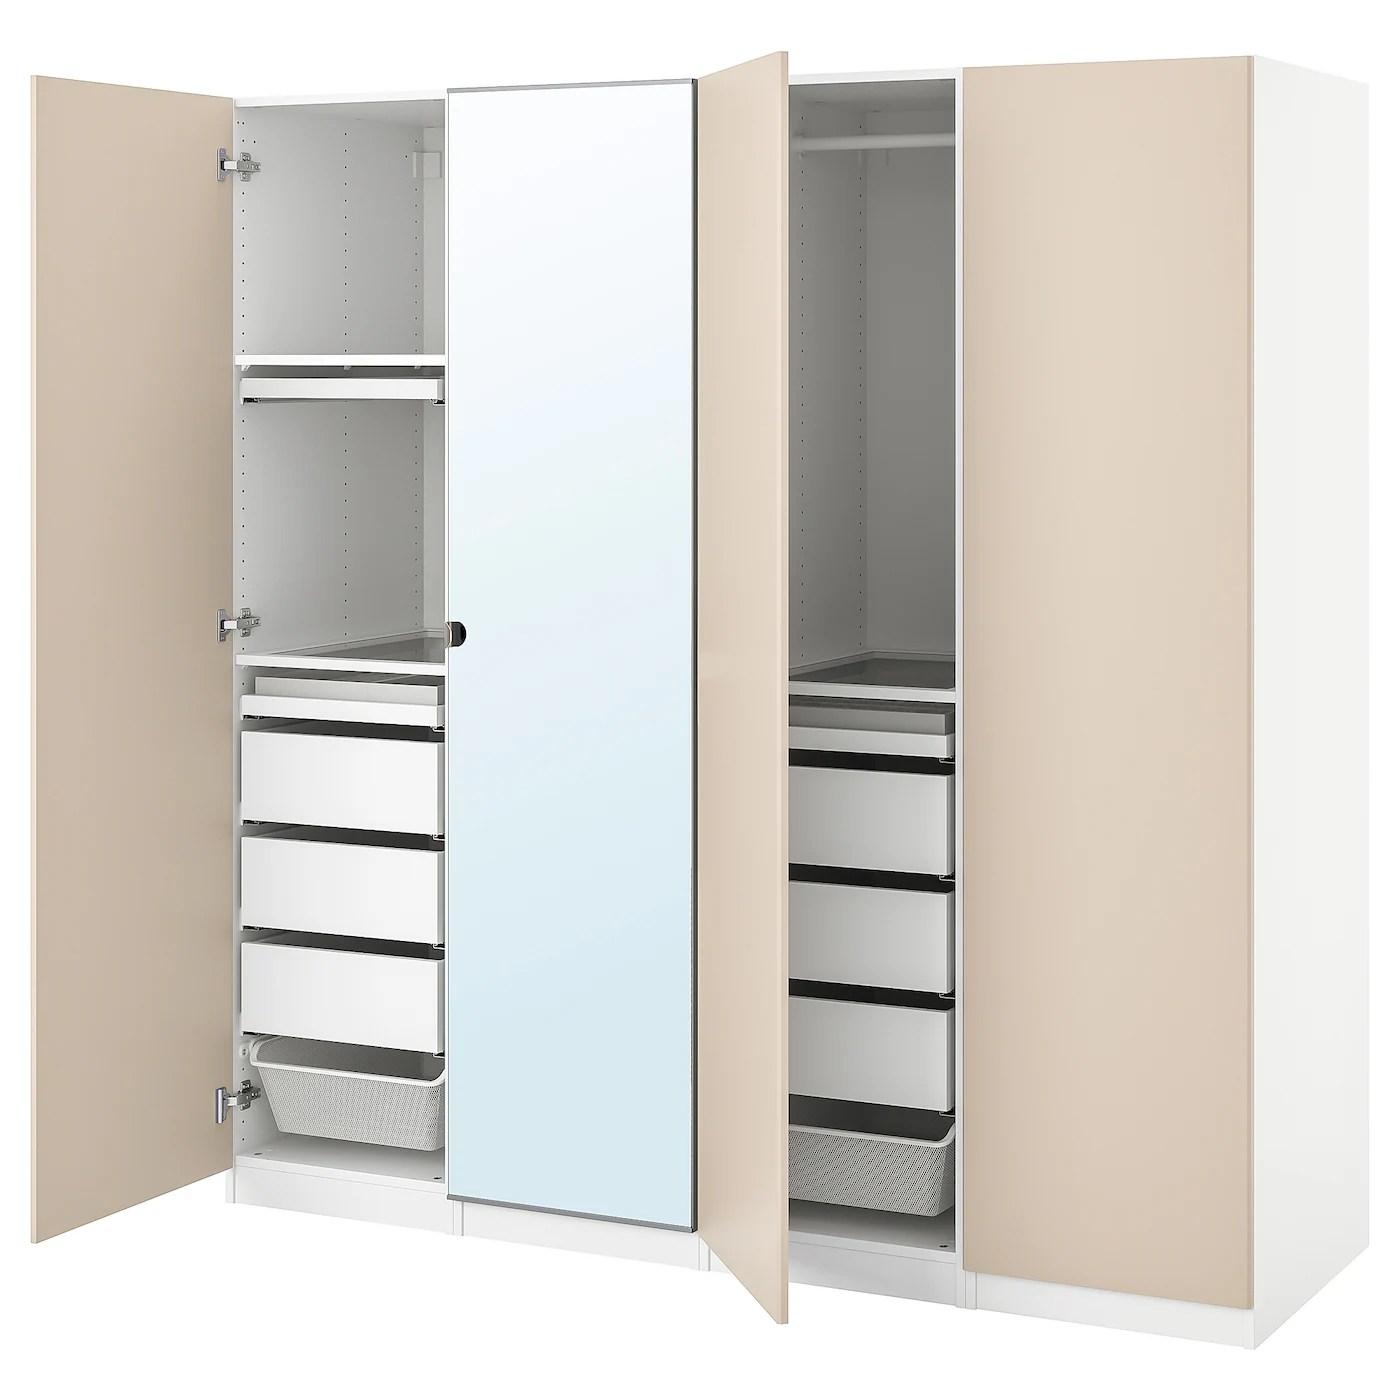 Pax Reinsvoll Vikedal Combi Armoire Blanc Gris Beige Miroir 200x60x201 Cm Ikea